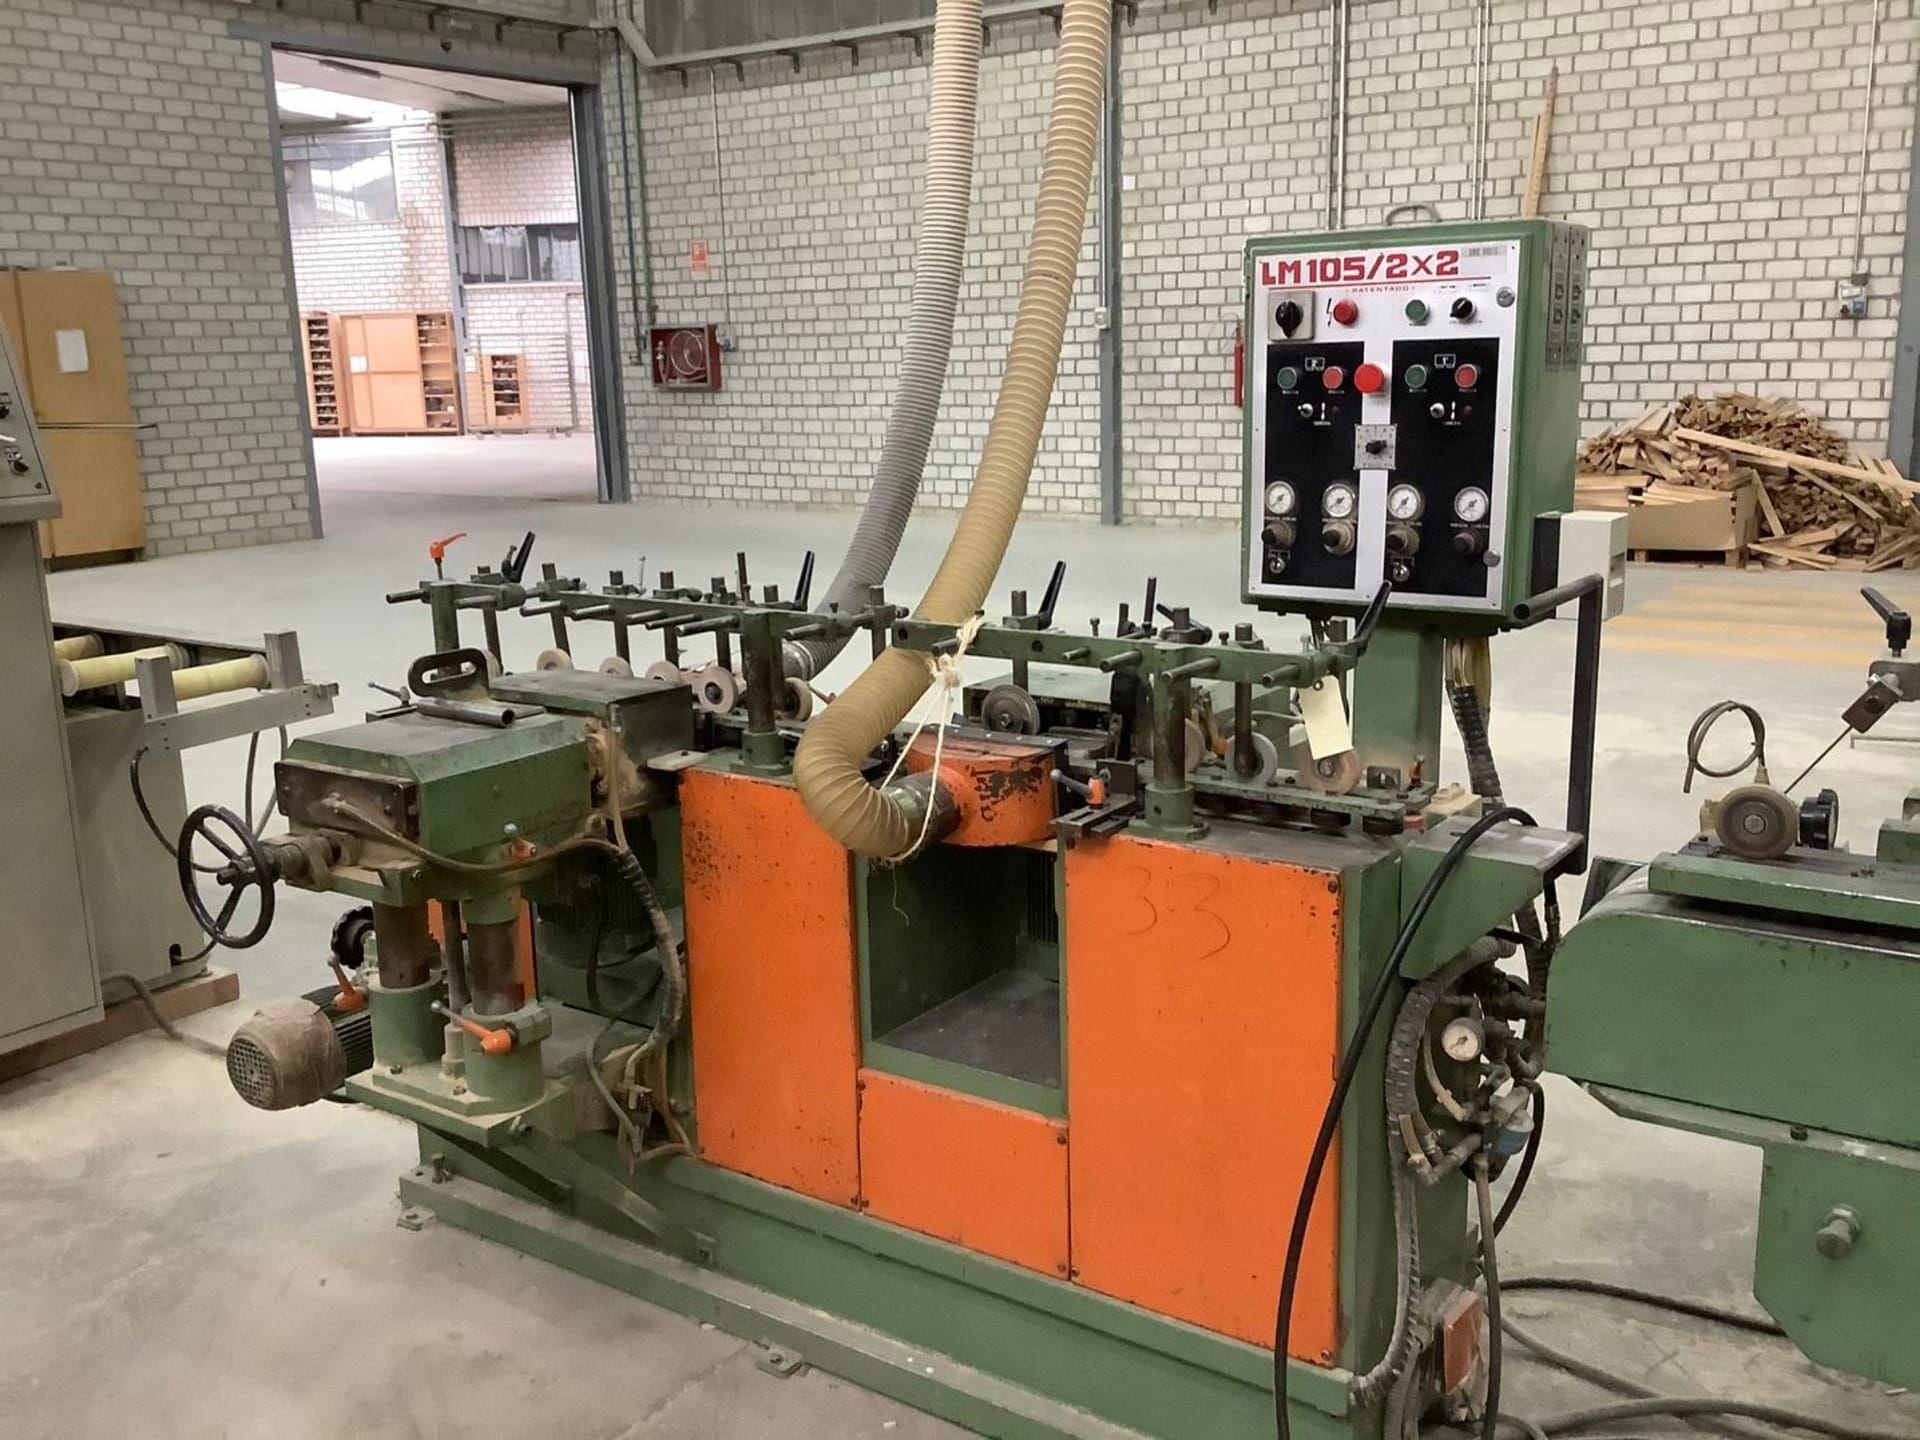 BALENCIAGA LM 105 2x2 Profilschleifmaschine